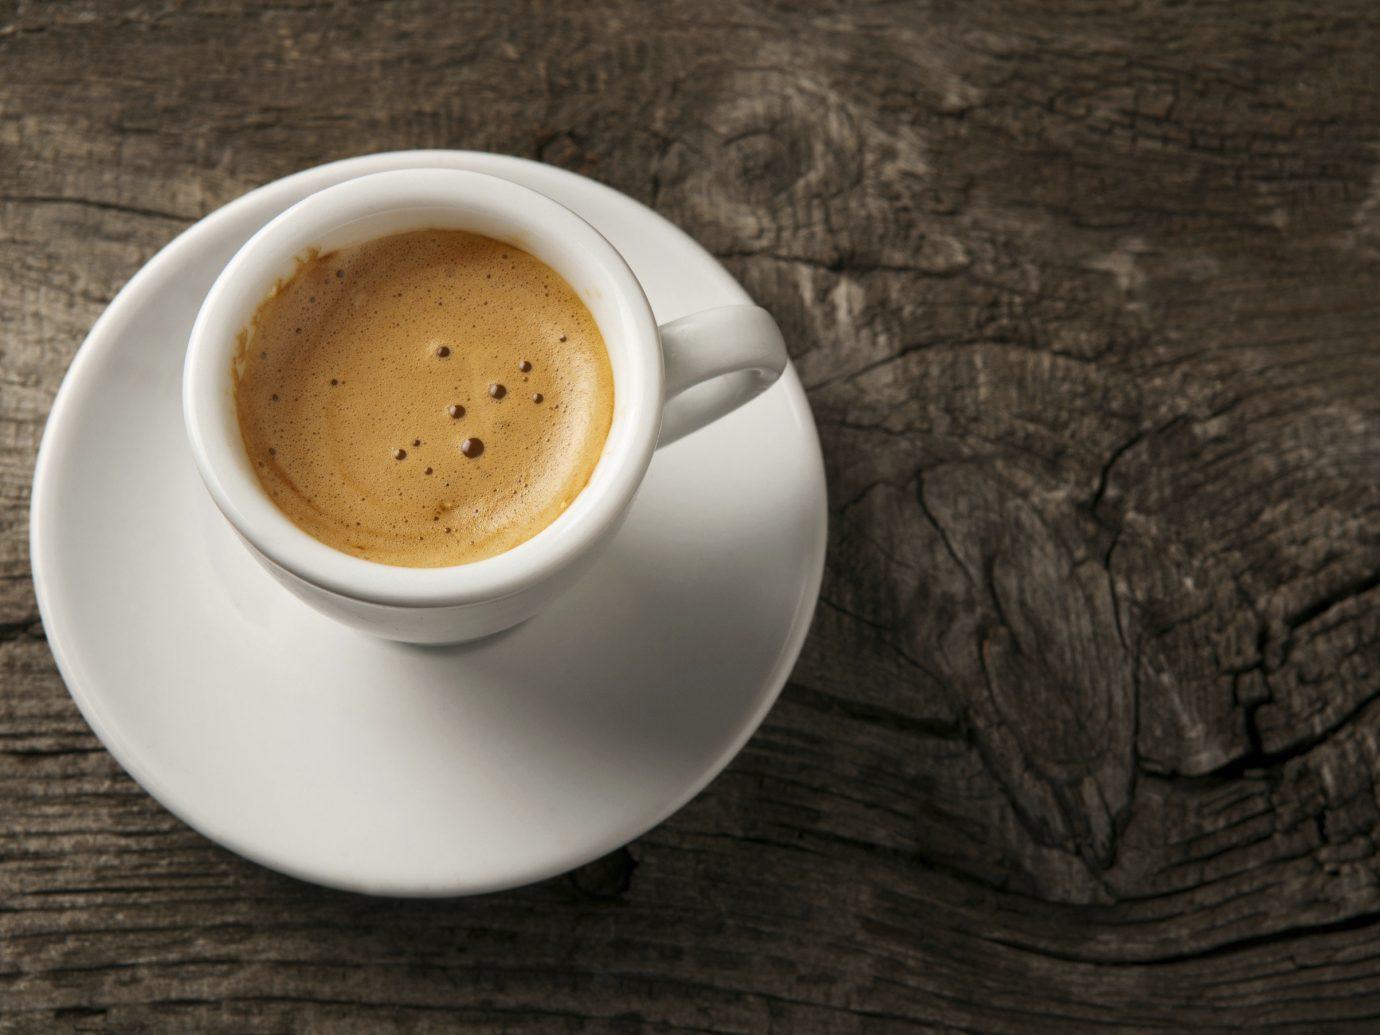 Trip Ideas coffee cup Drink coffee cup beverage coffee milk caffeine latte espresso caffè macchiato flavor café au lait breakfast soup